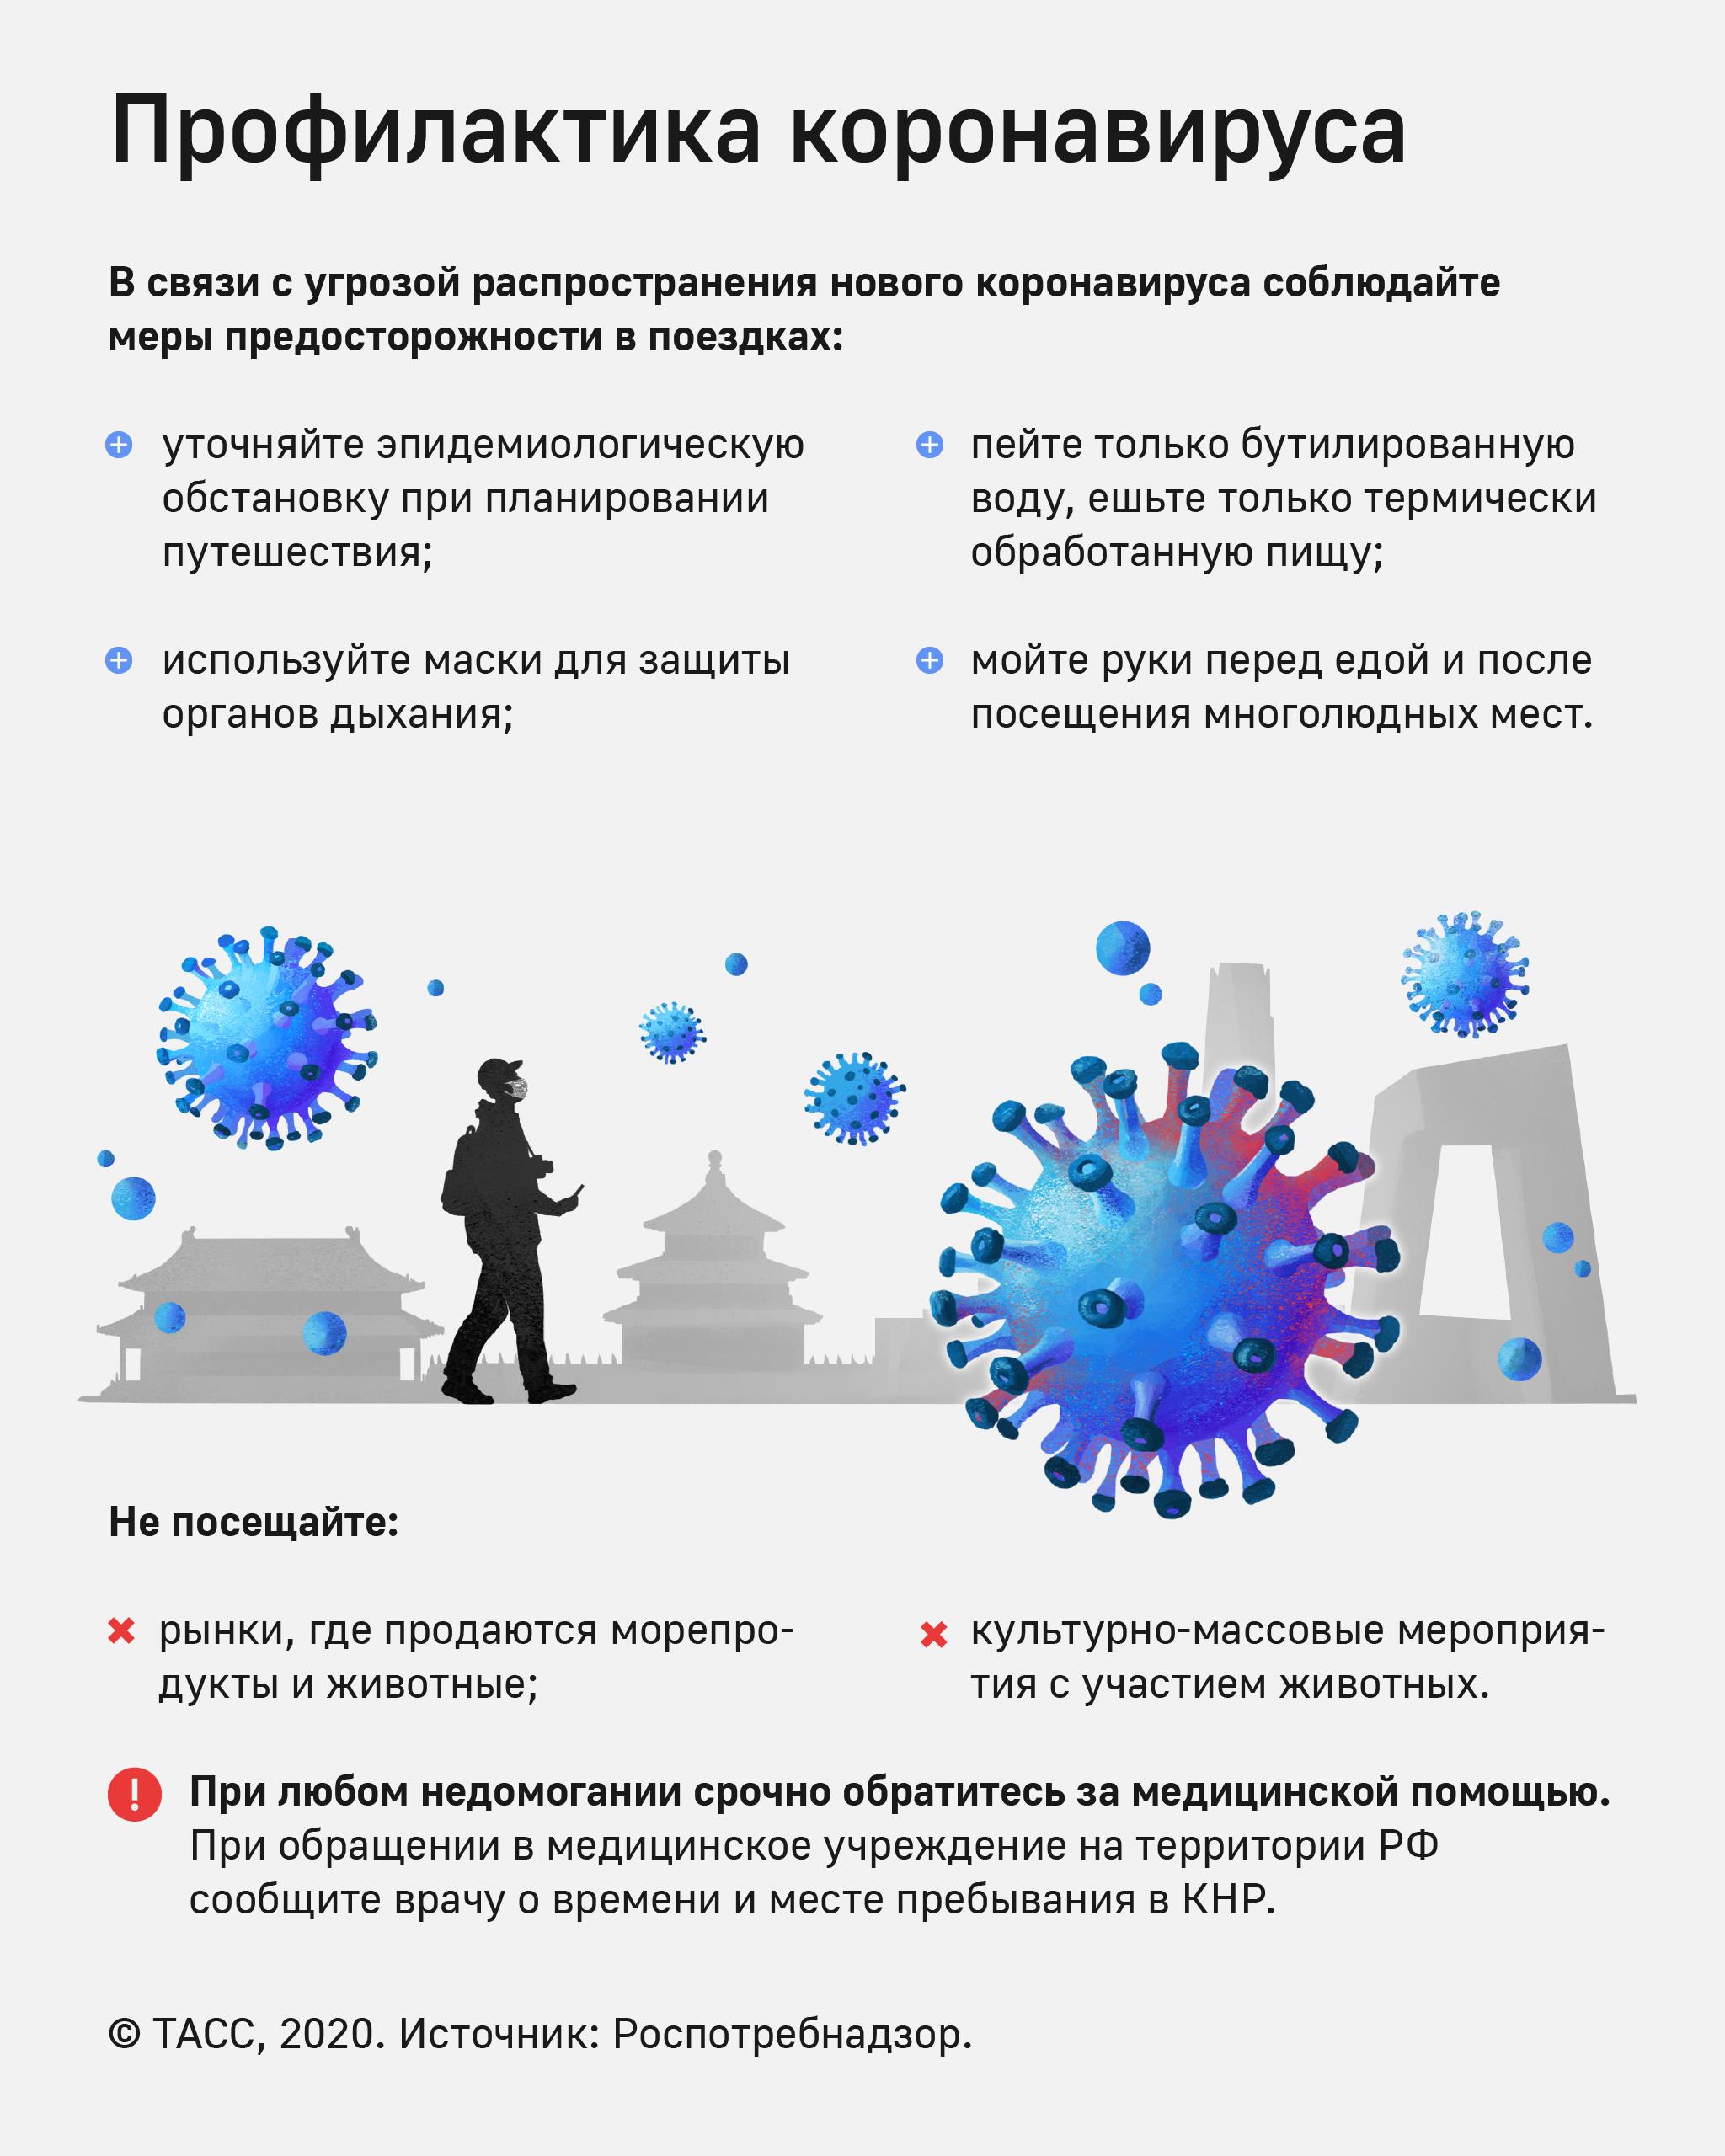 Латентный — это как | ktonanovenkogo.ru